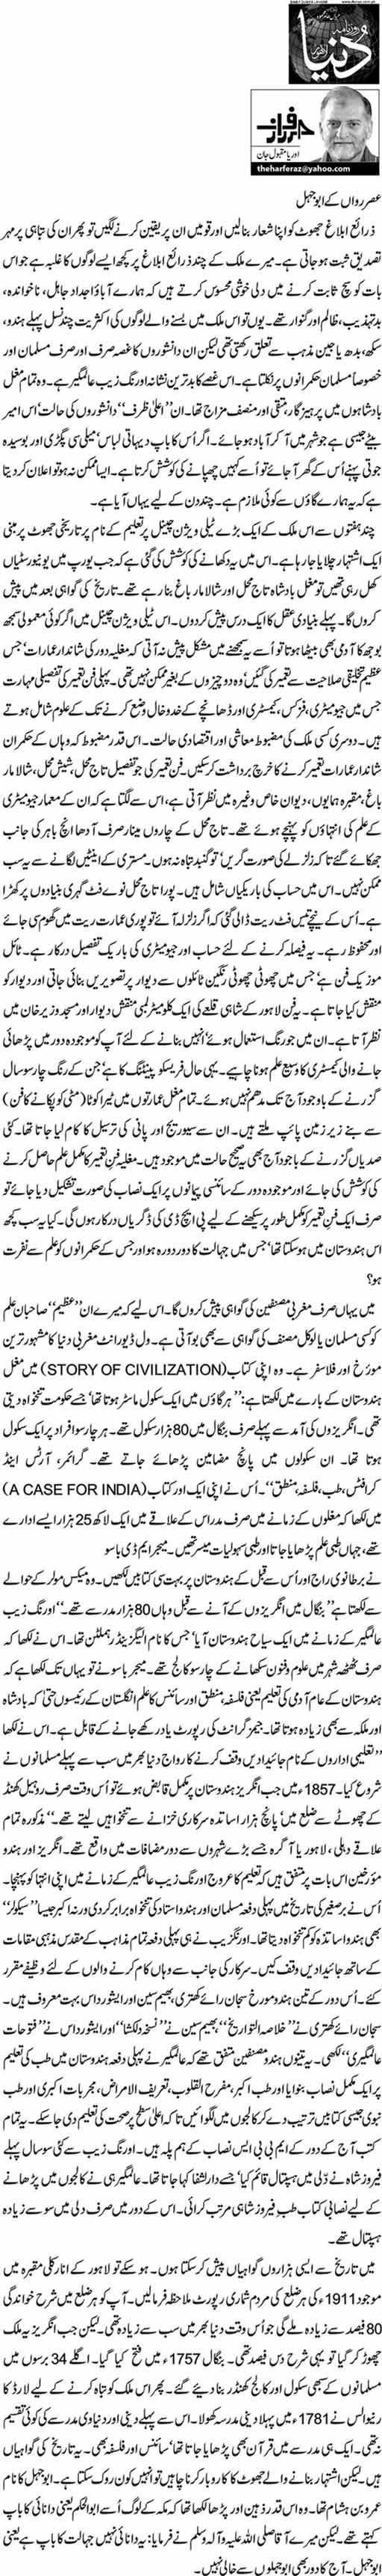 Asar e rawan k Abu Jahil - Orya Maqbool Jaan